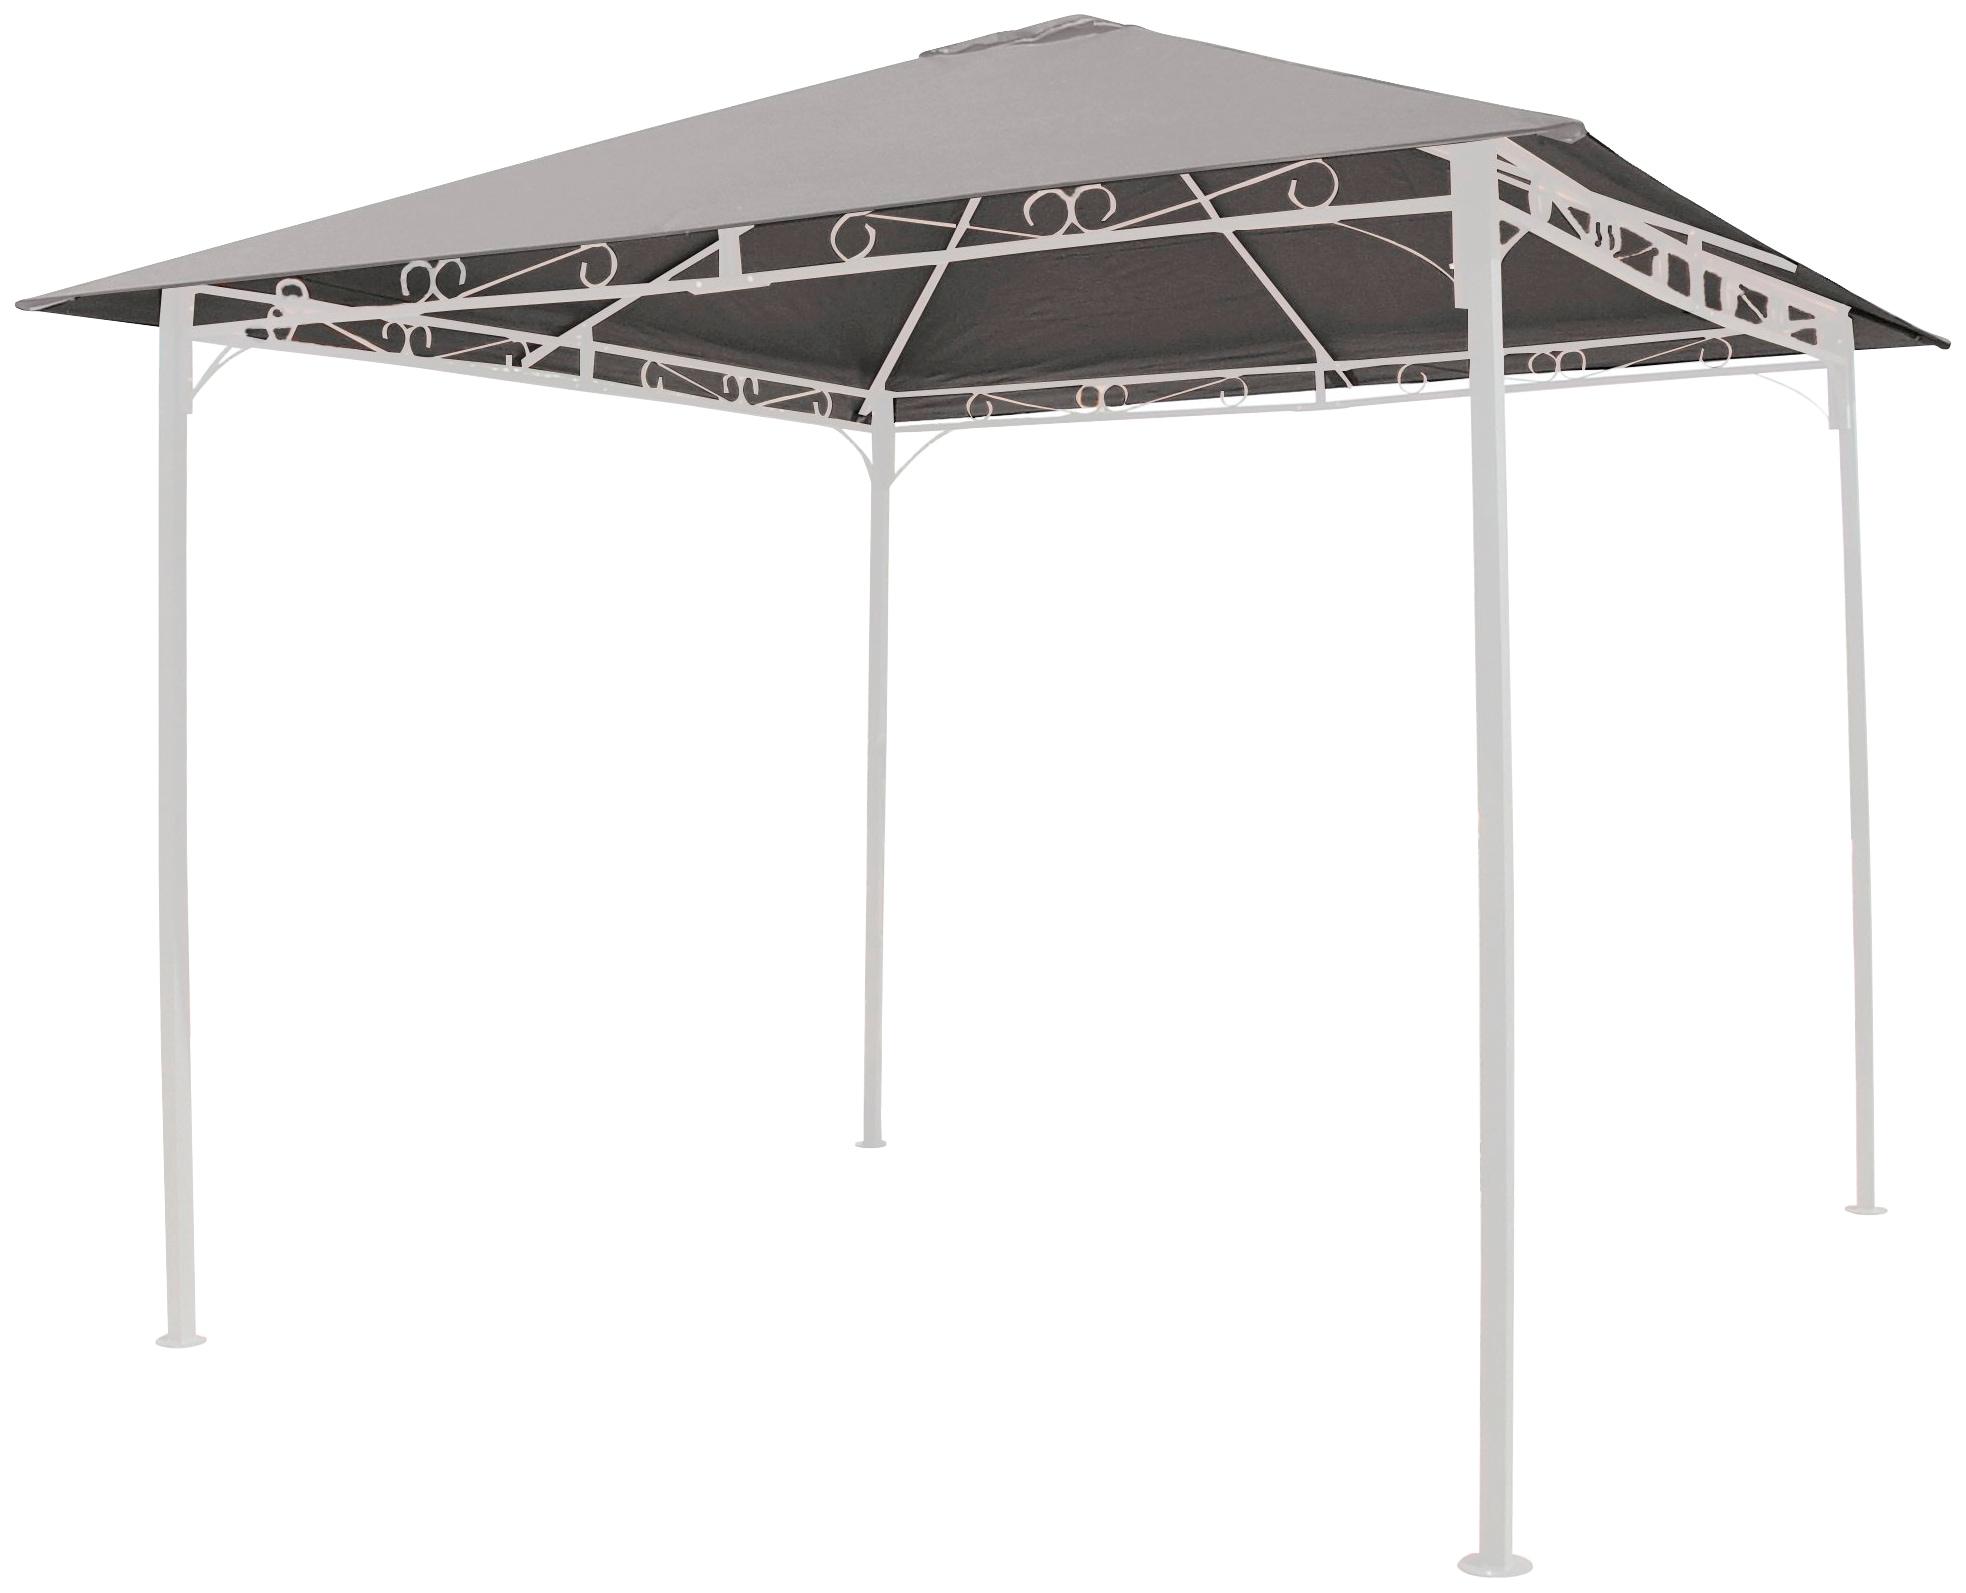 Grasekamp Pavillonersatzdach Rimini/Amalfi, BxT: 293x293 cm günstig online kaufen